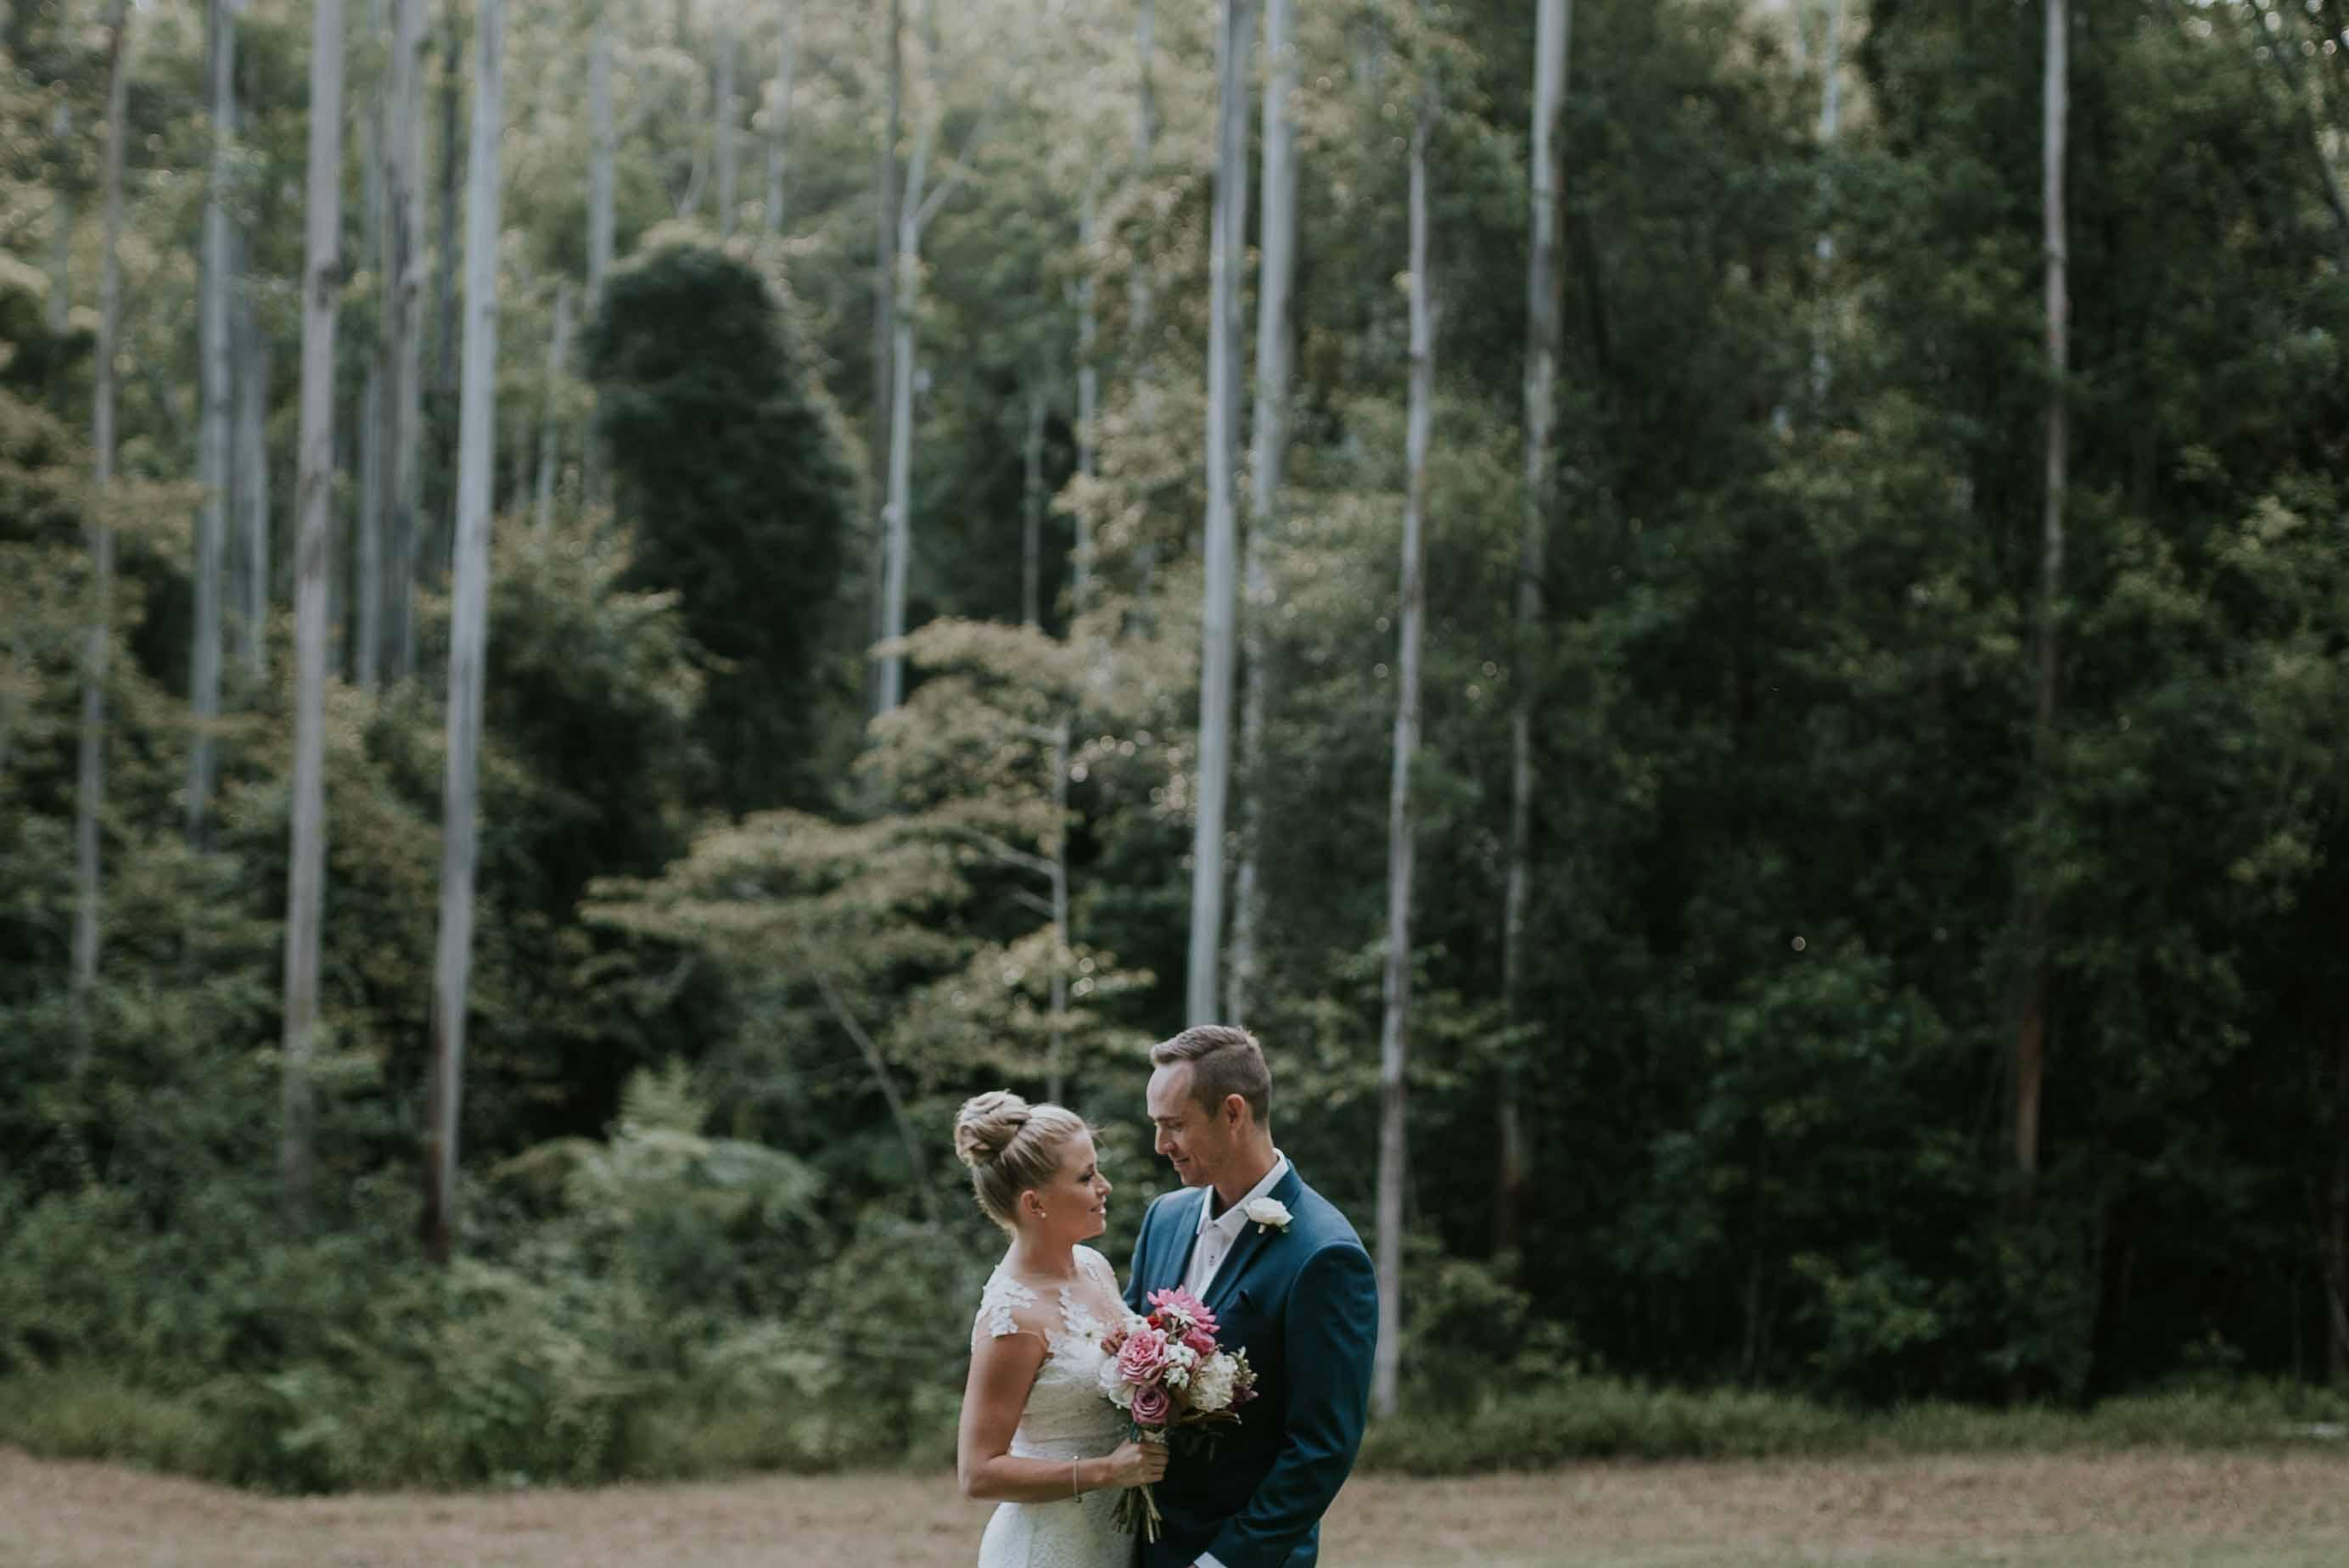 Matt + Haylee | 09/04/2017 | Coffs Harbour Wedding Video | Bonville Golf Resort, Bonville, NSW